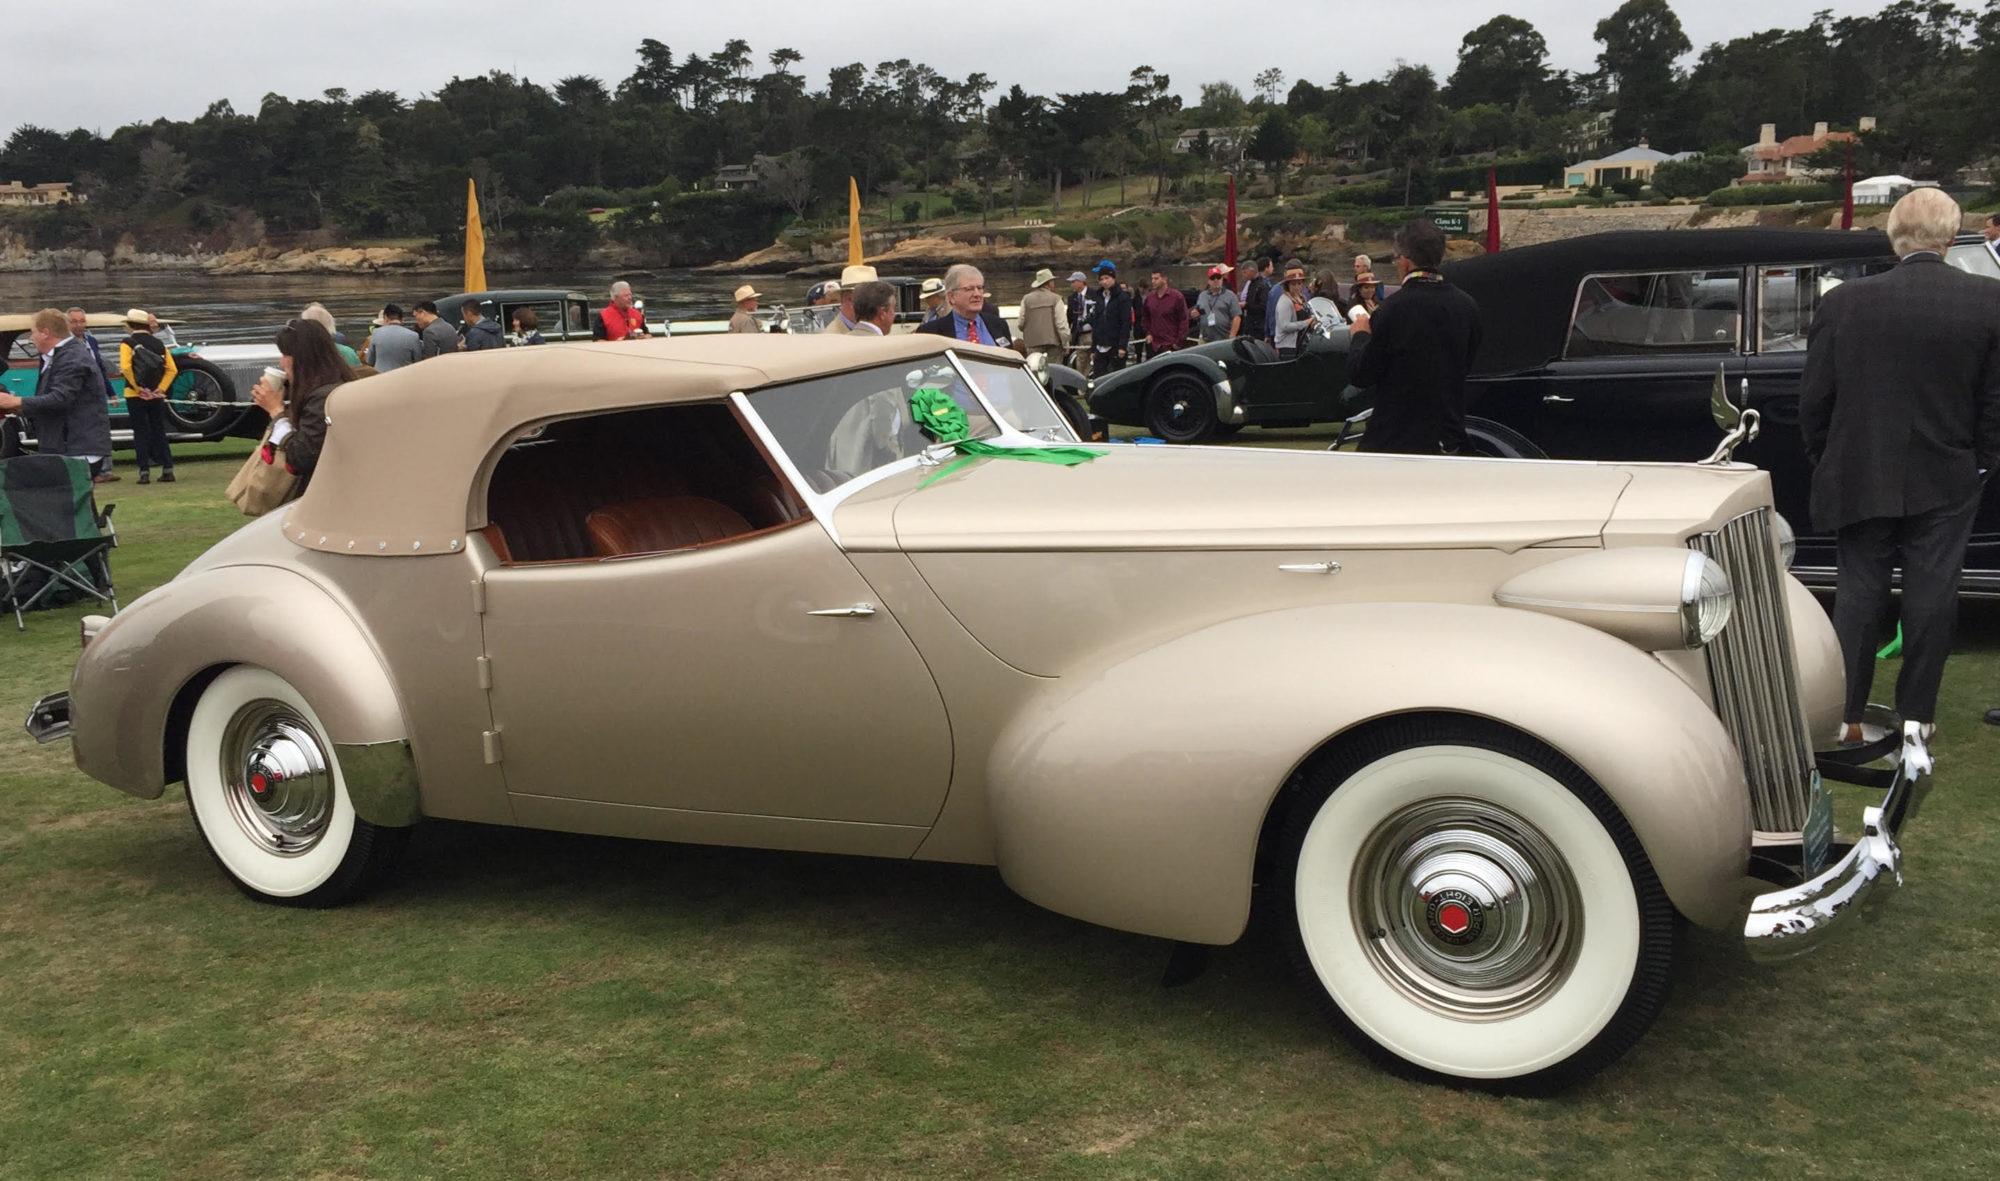 1939 Packard 1703 Super-8 Darrin Convertible Victoria | The Milwaukee Masterpiece